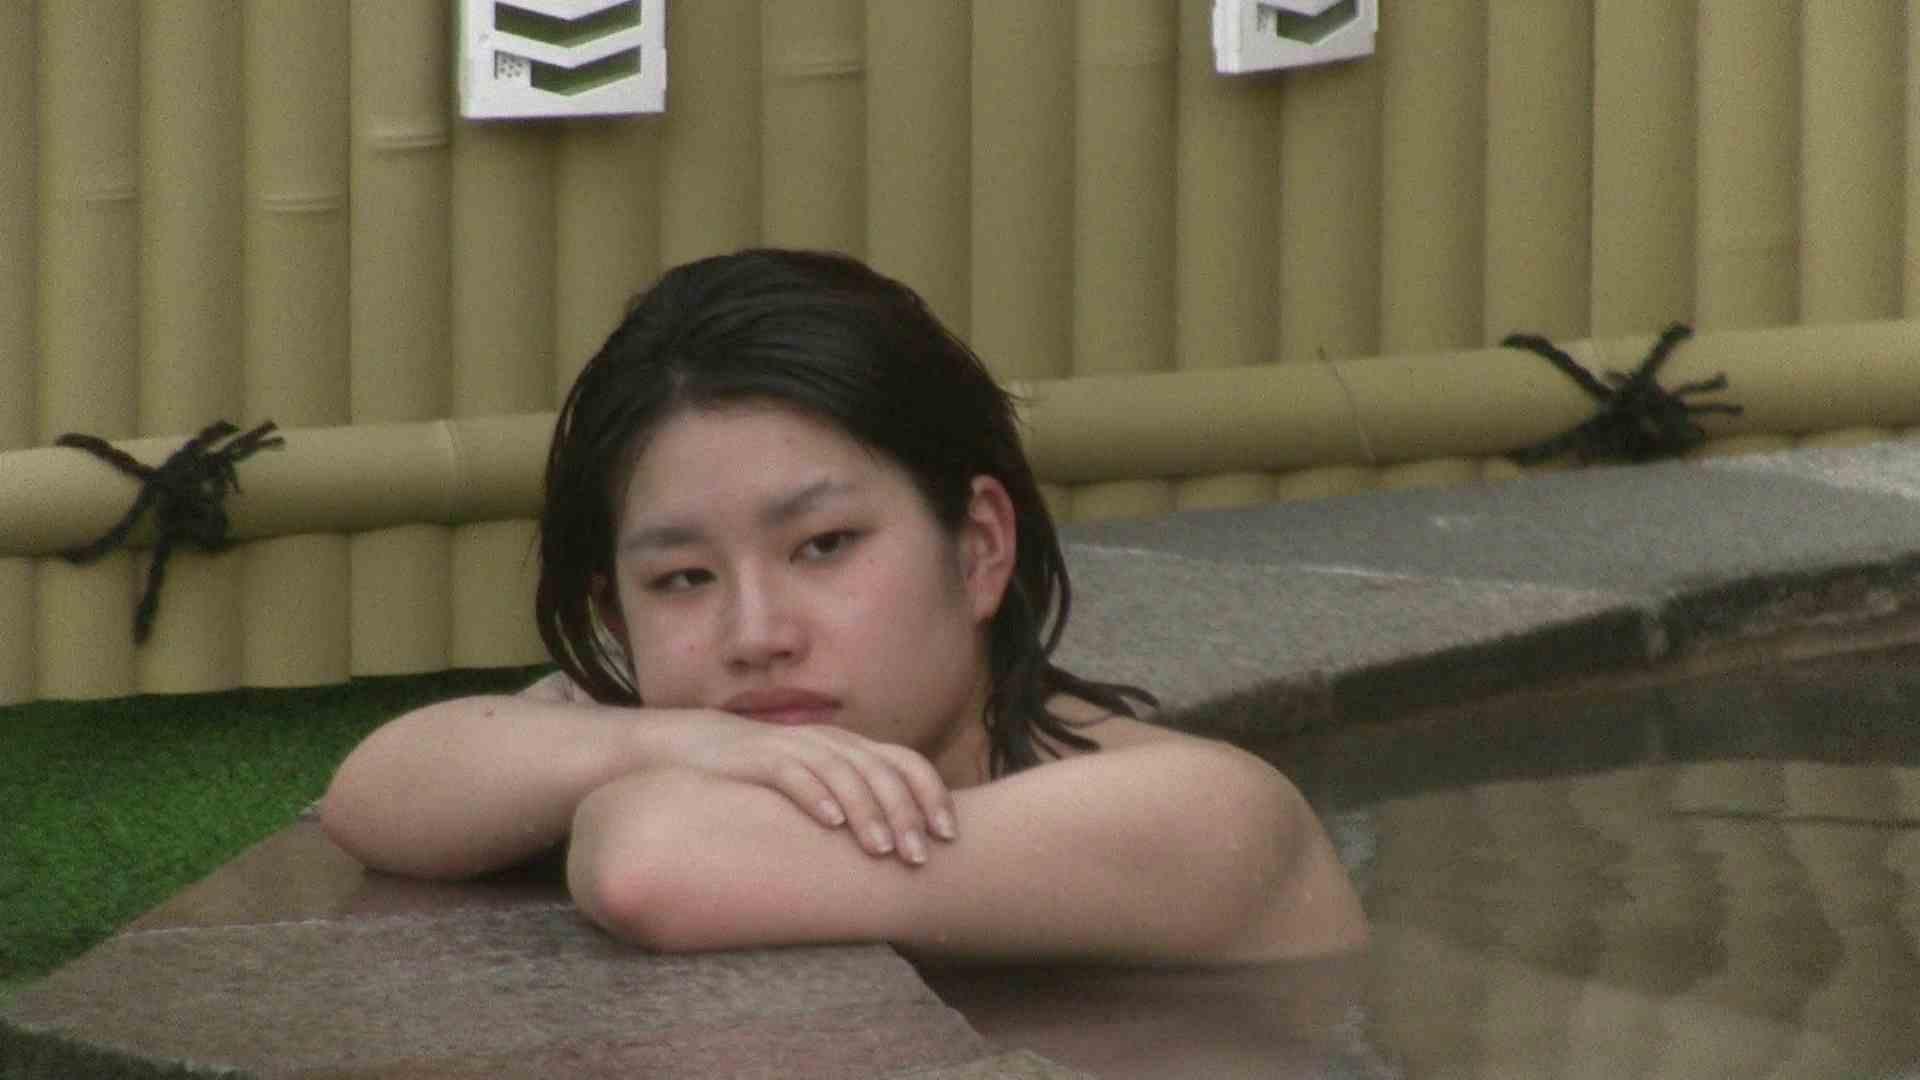 Aquaな露天風呂Vol.230 HなOL | 盗撮  83pic 27